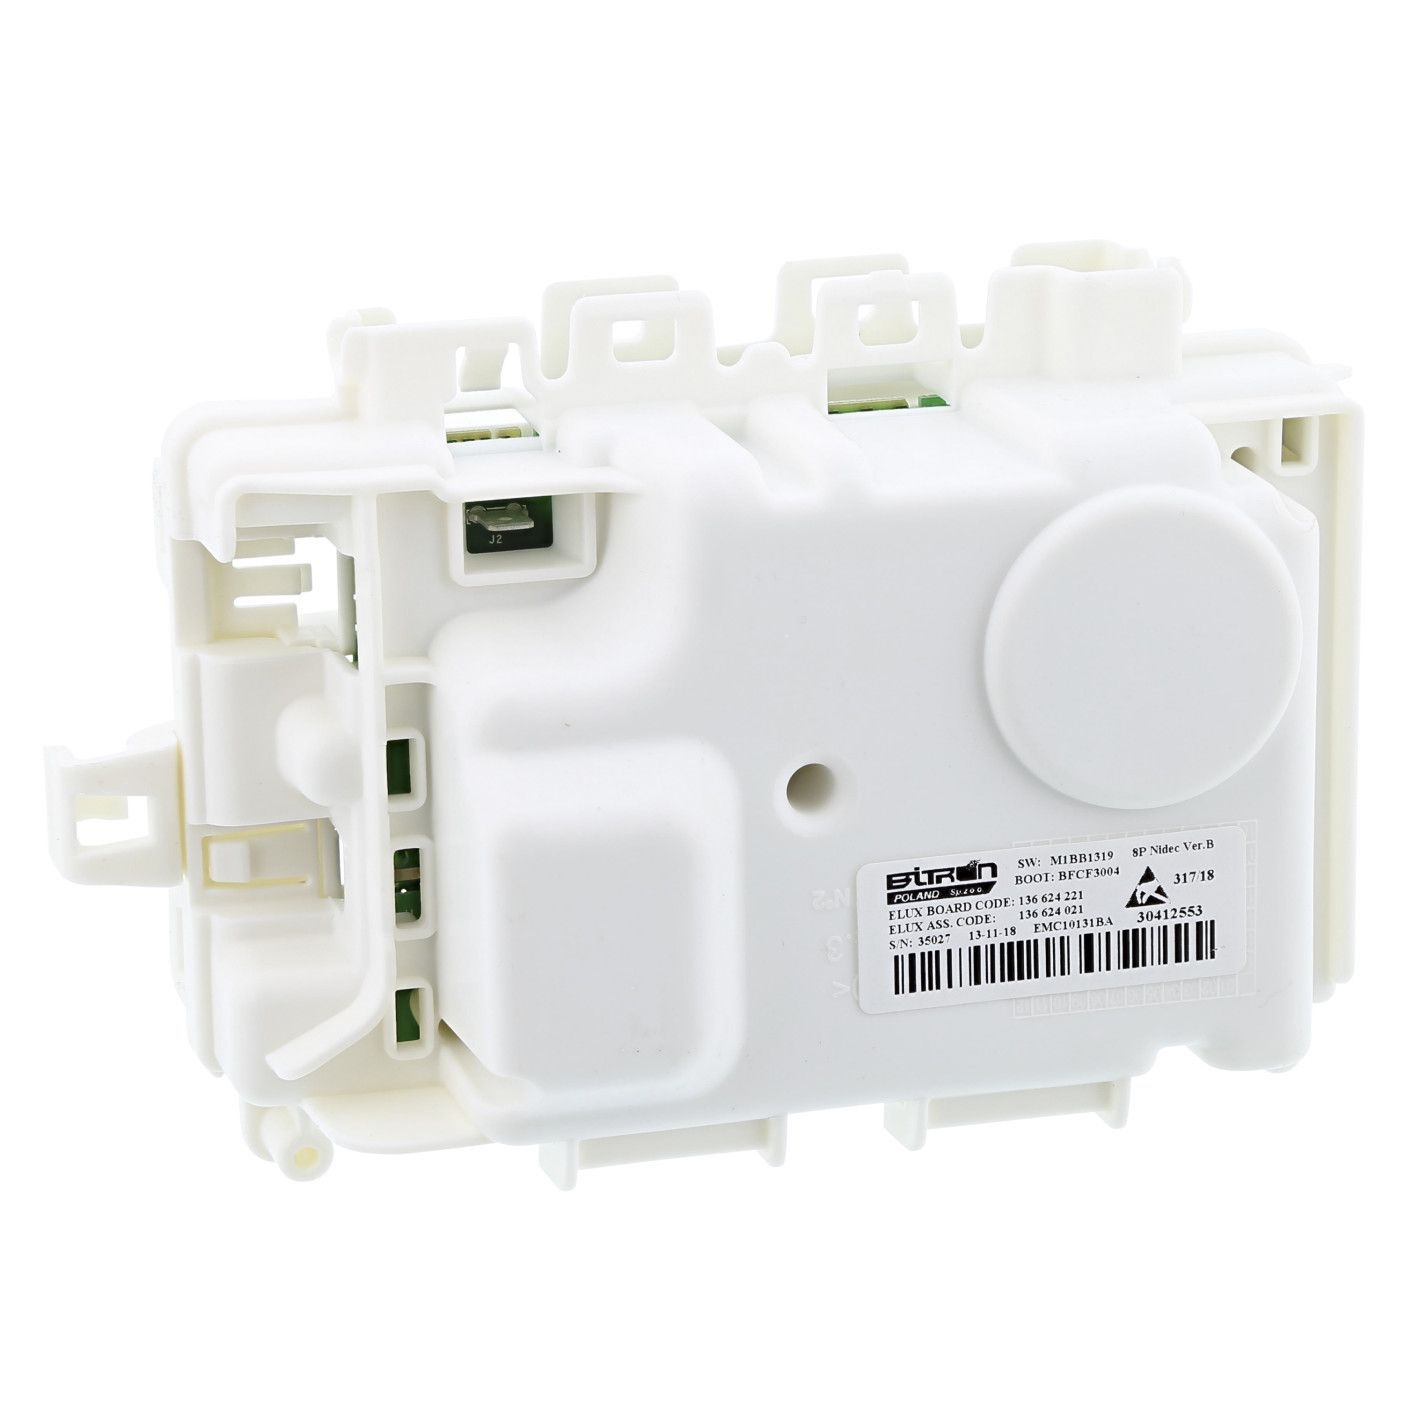 Měnič, elektronika motoru do sušičky AEG, Electrolux - 1366240214 AEG / Electrolux / Zanussi